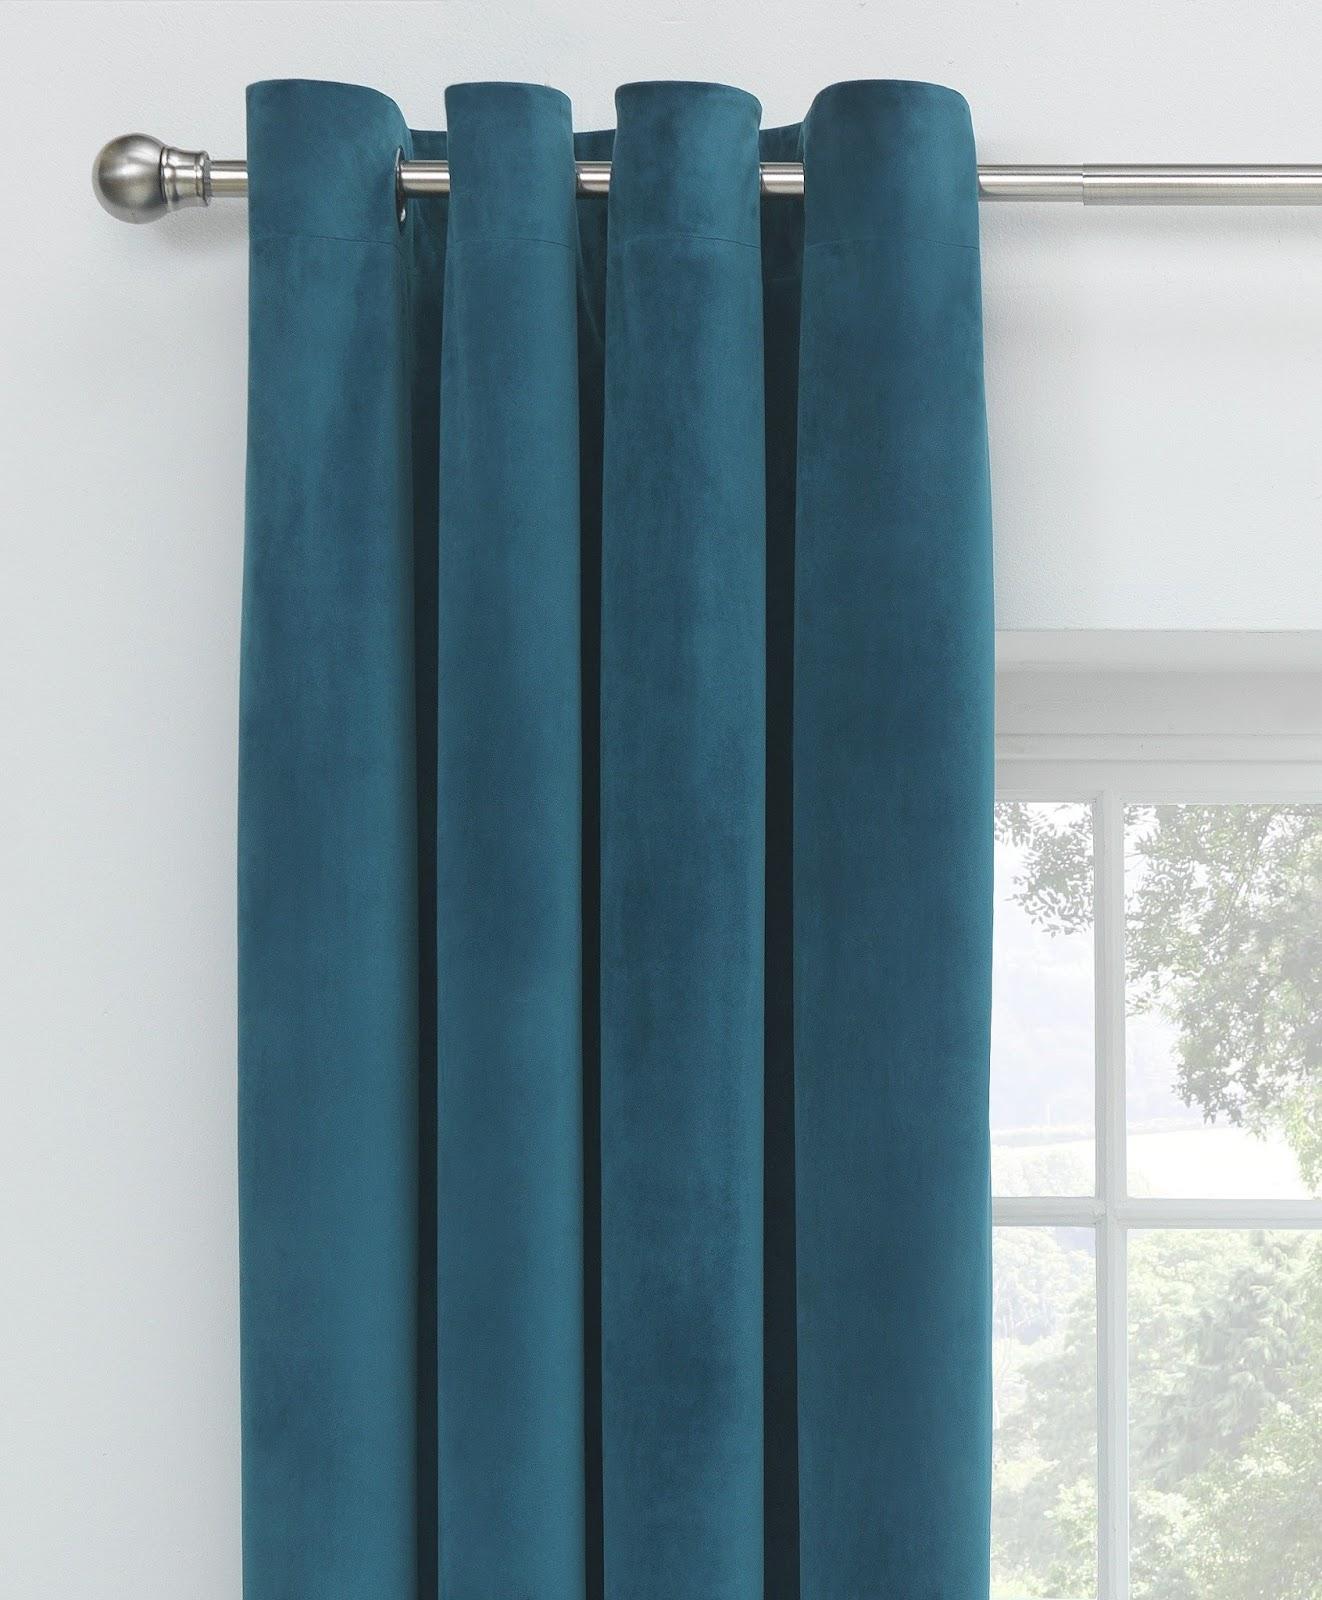 Kwik-Up Curtain Rod Bracket L Shape Shower Rail Shaped Bathroom Rods